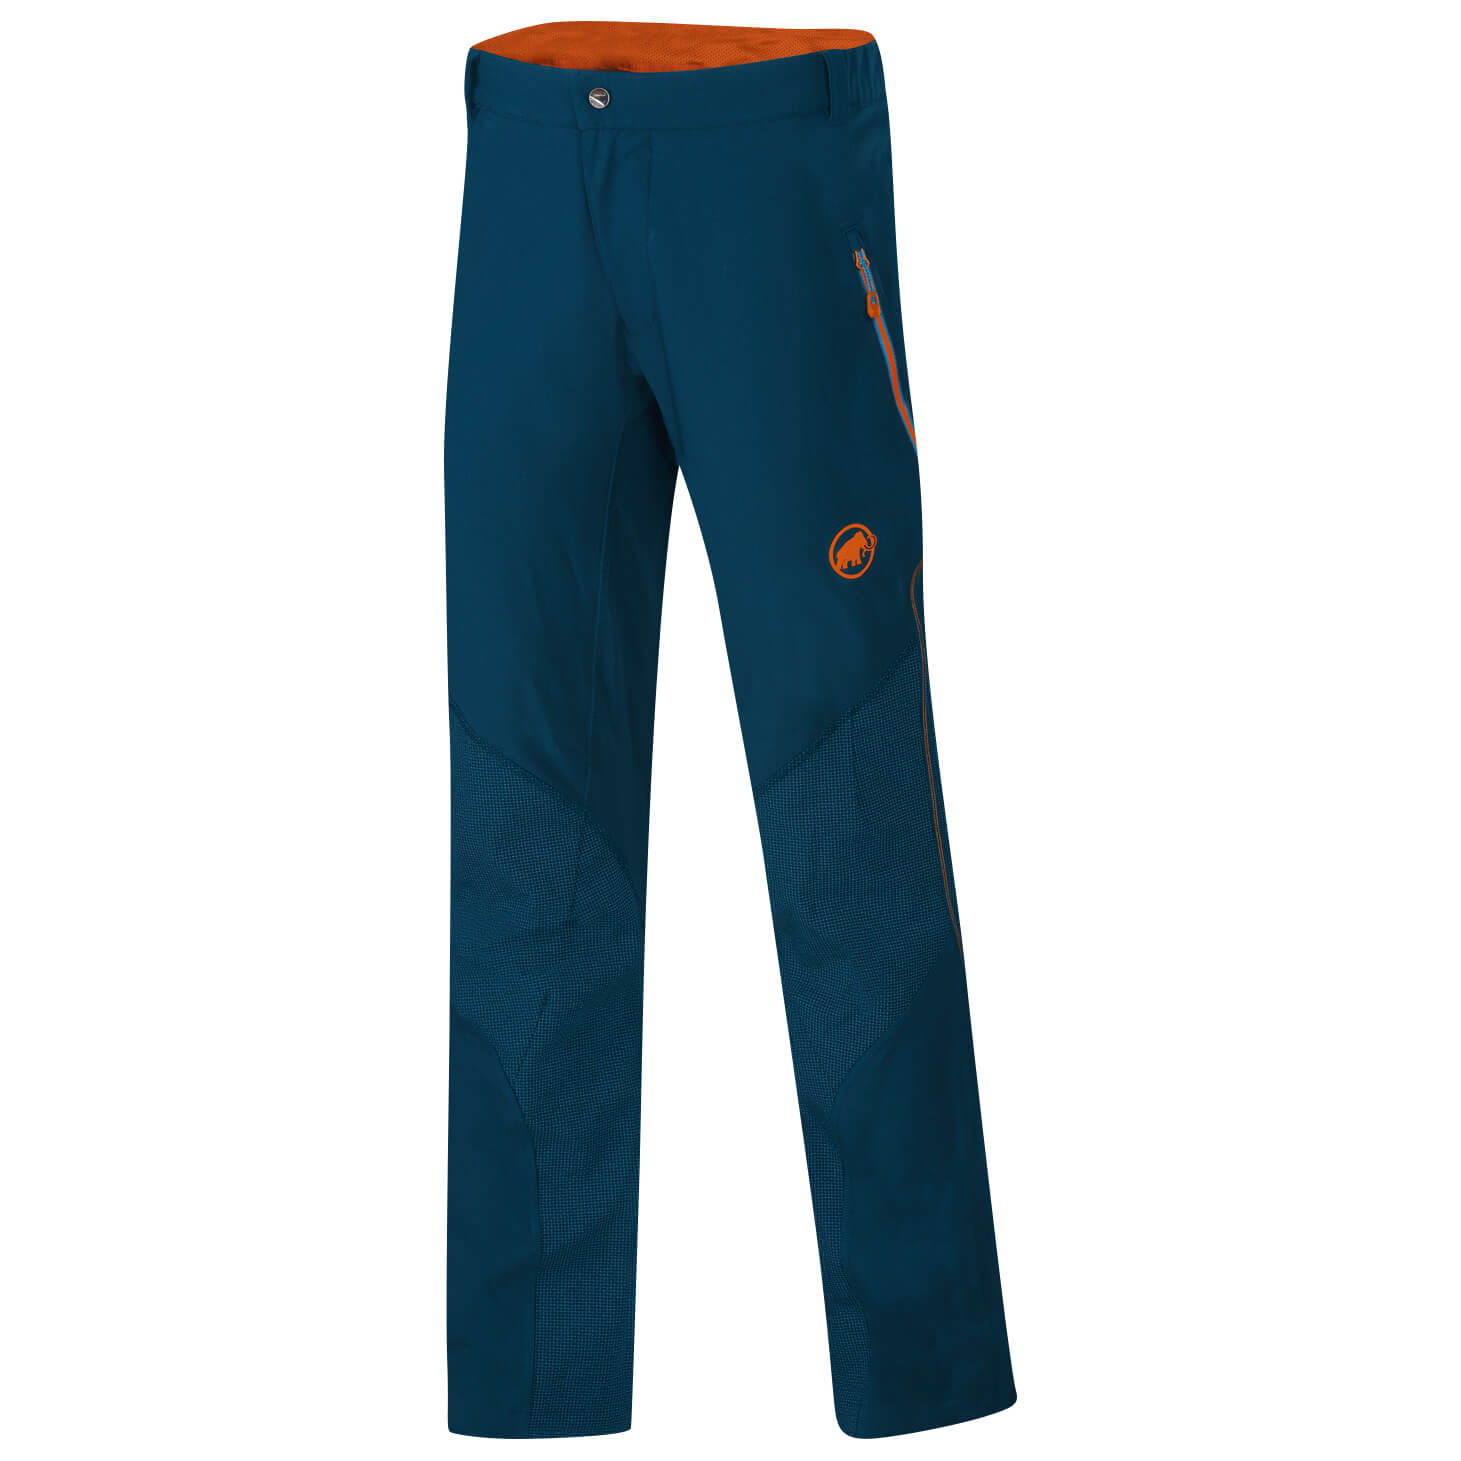 Innovative Mammut Luina HS Pants  Ski Pant Women39s  Buy Online  Alpinetrekco